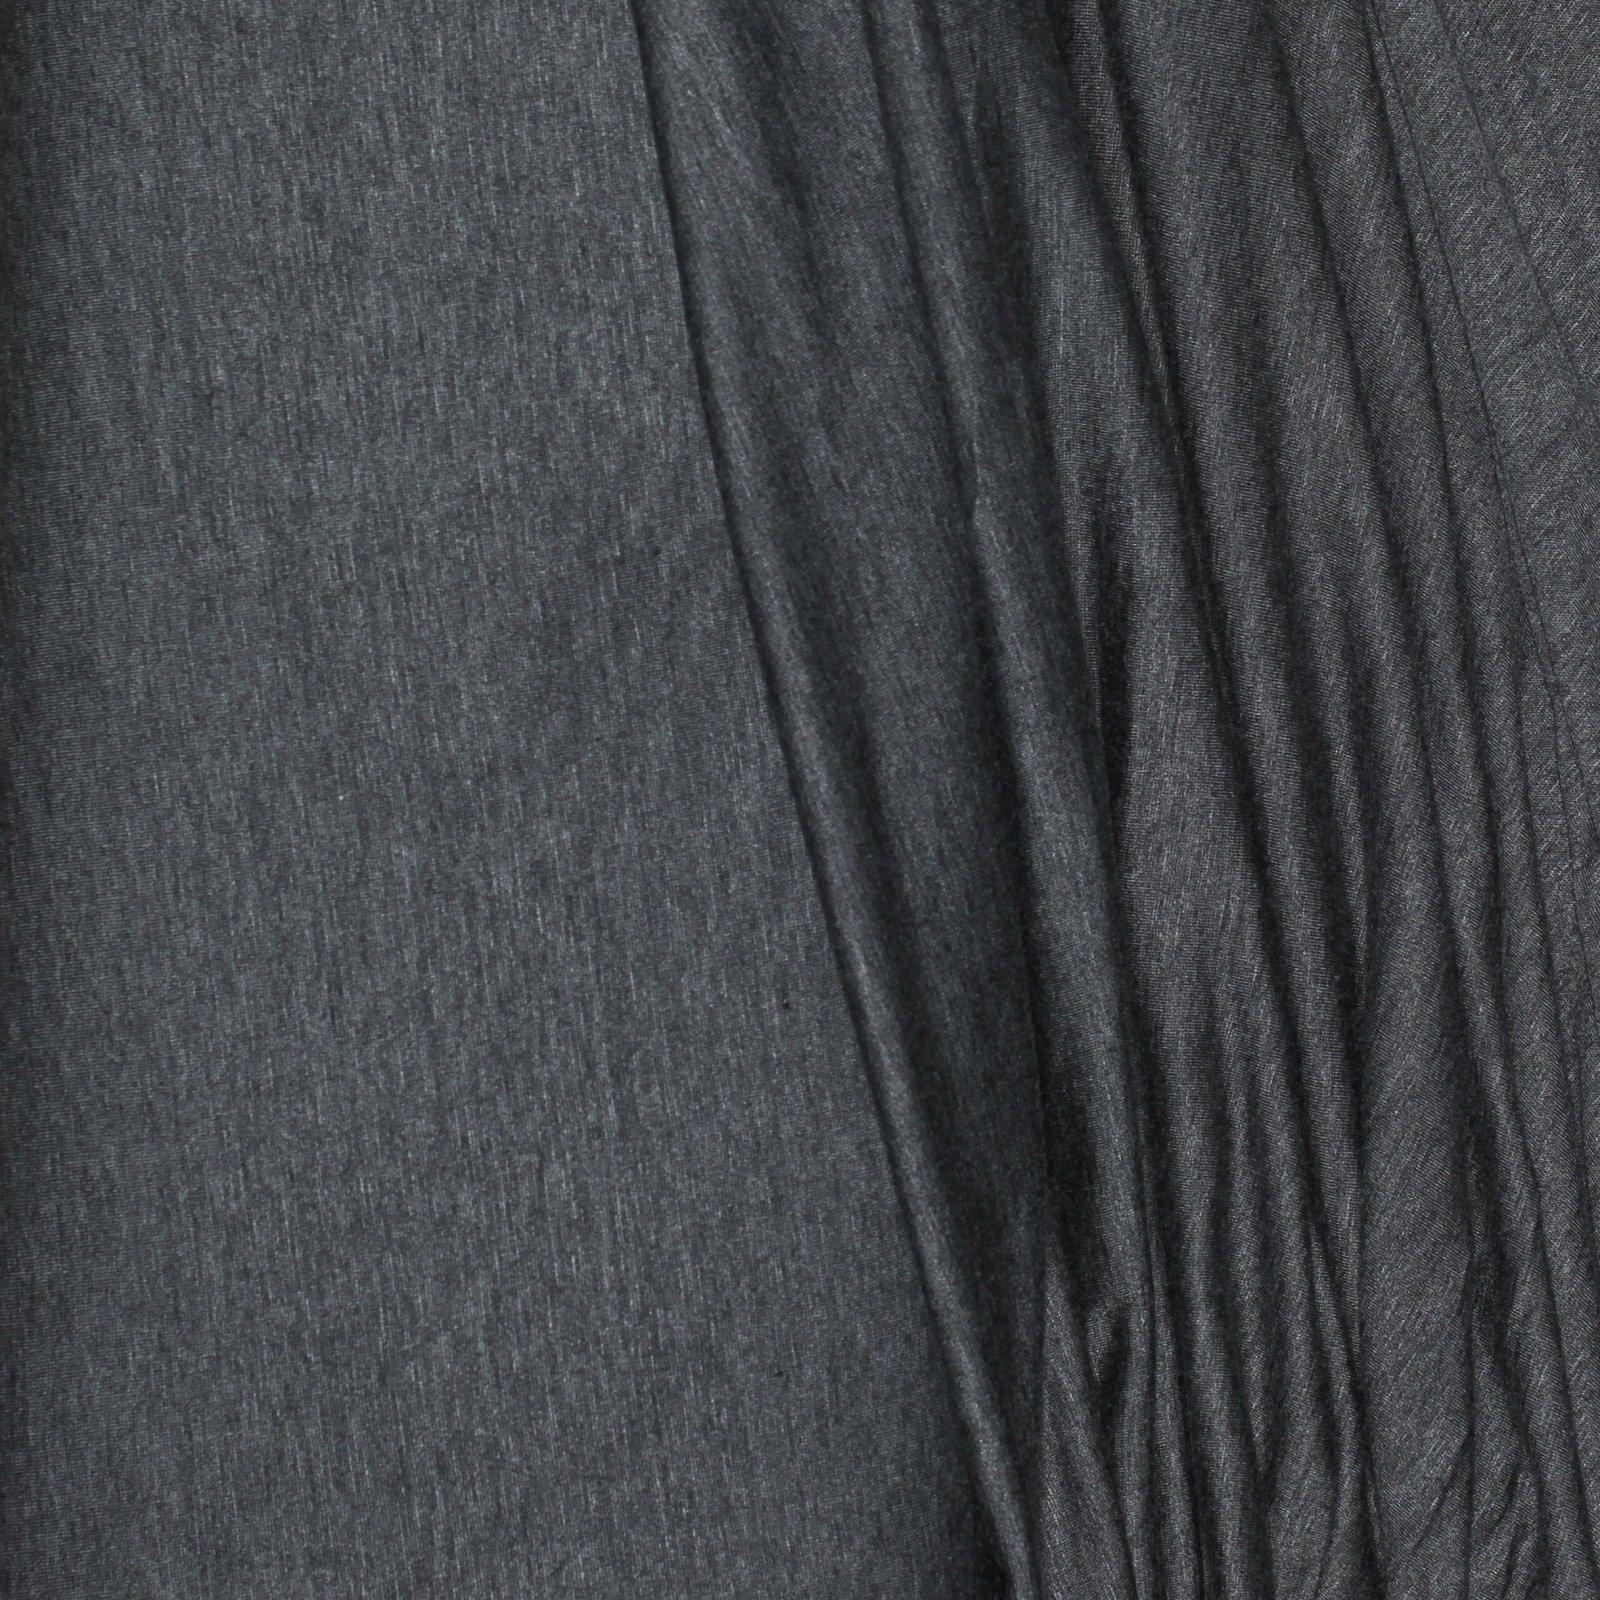 Rayon Jersey Charcoal